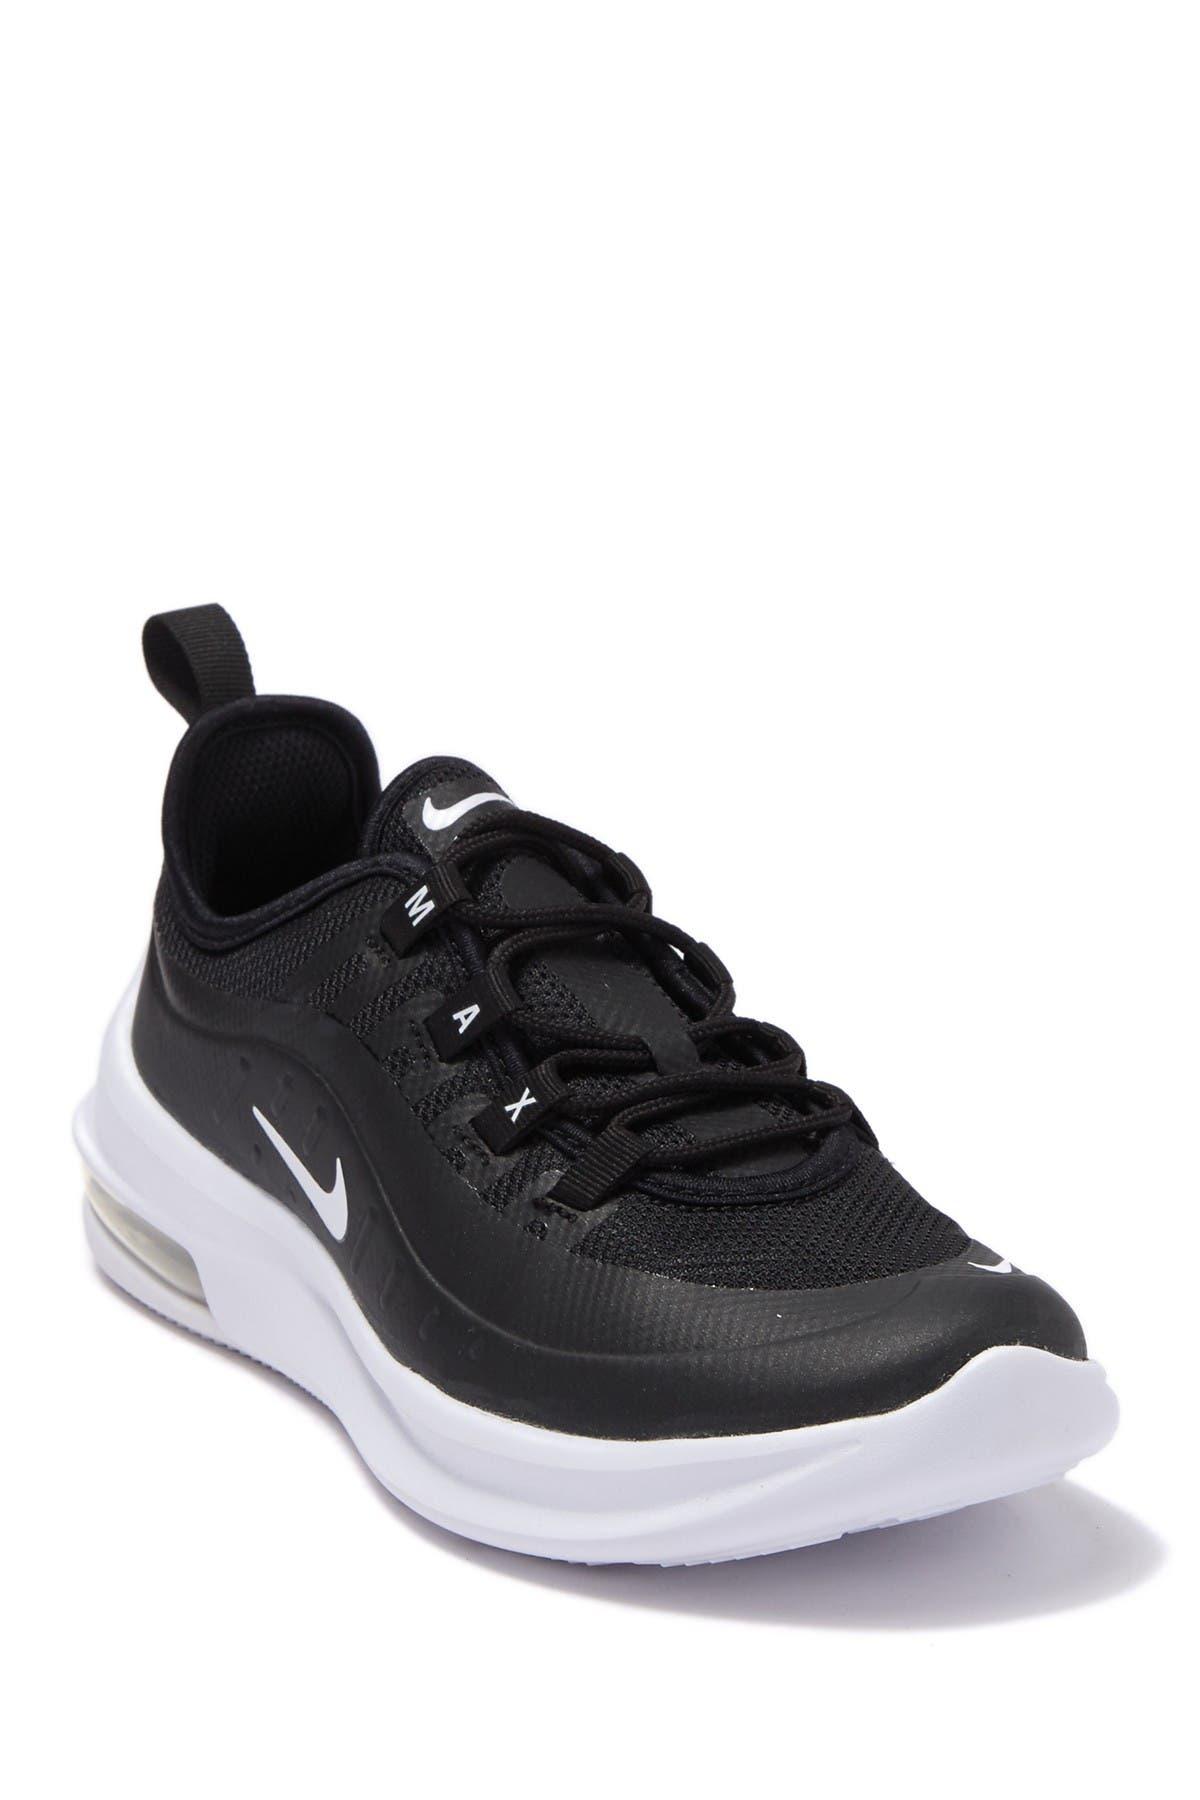 Nike   Air Max Axis Running Sneaker